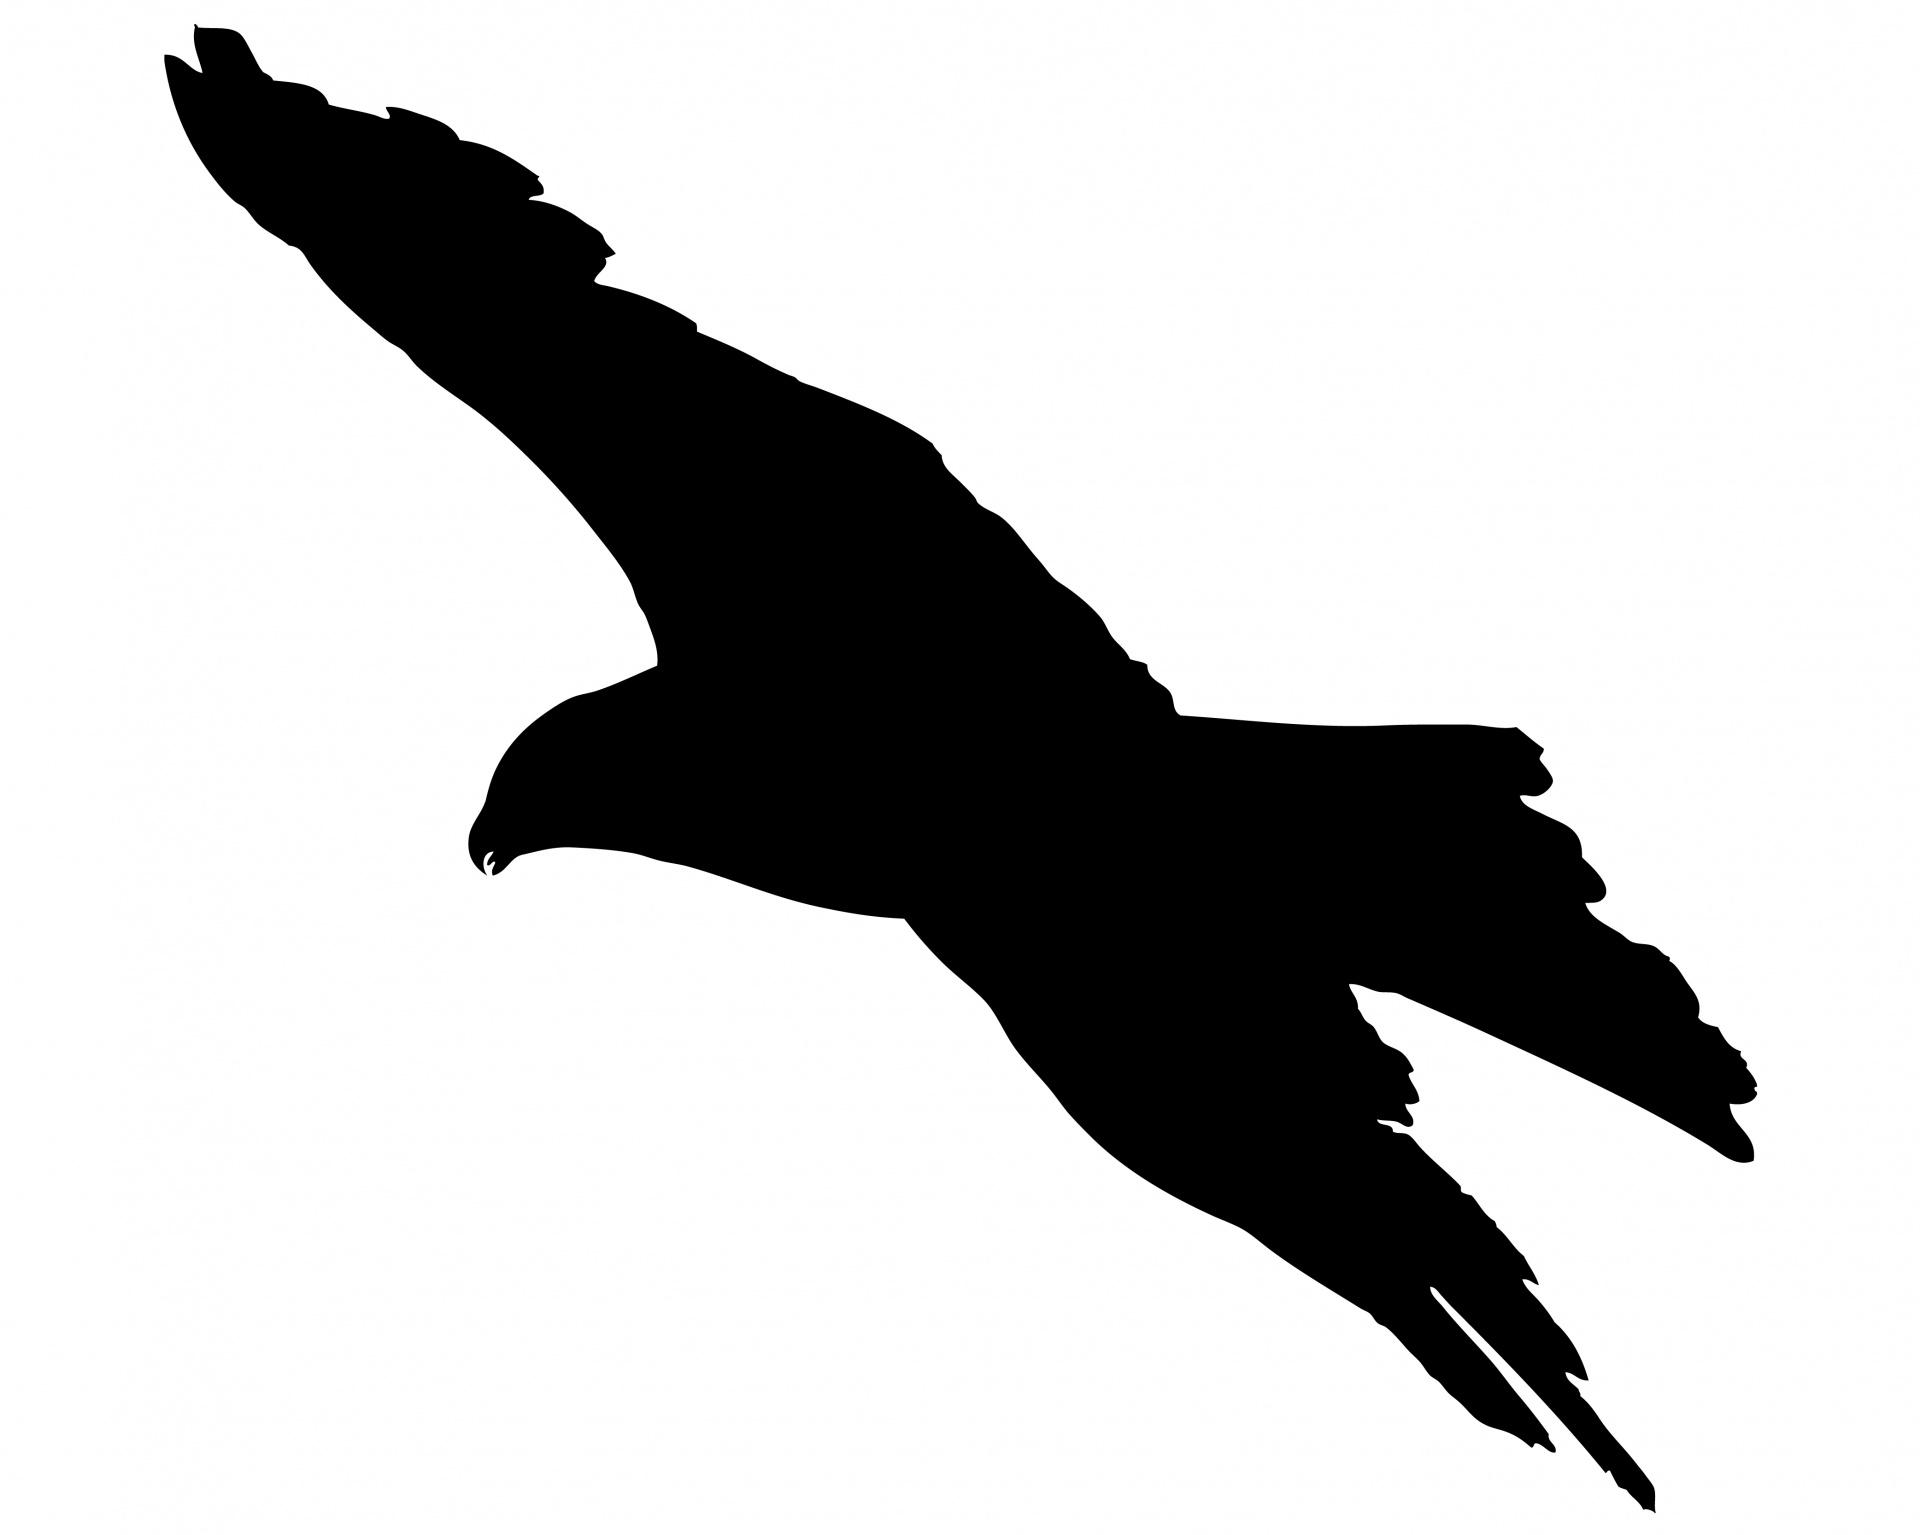 1920x1535 Bird Flying Silhouette Free Stock Photo